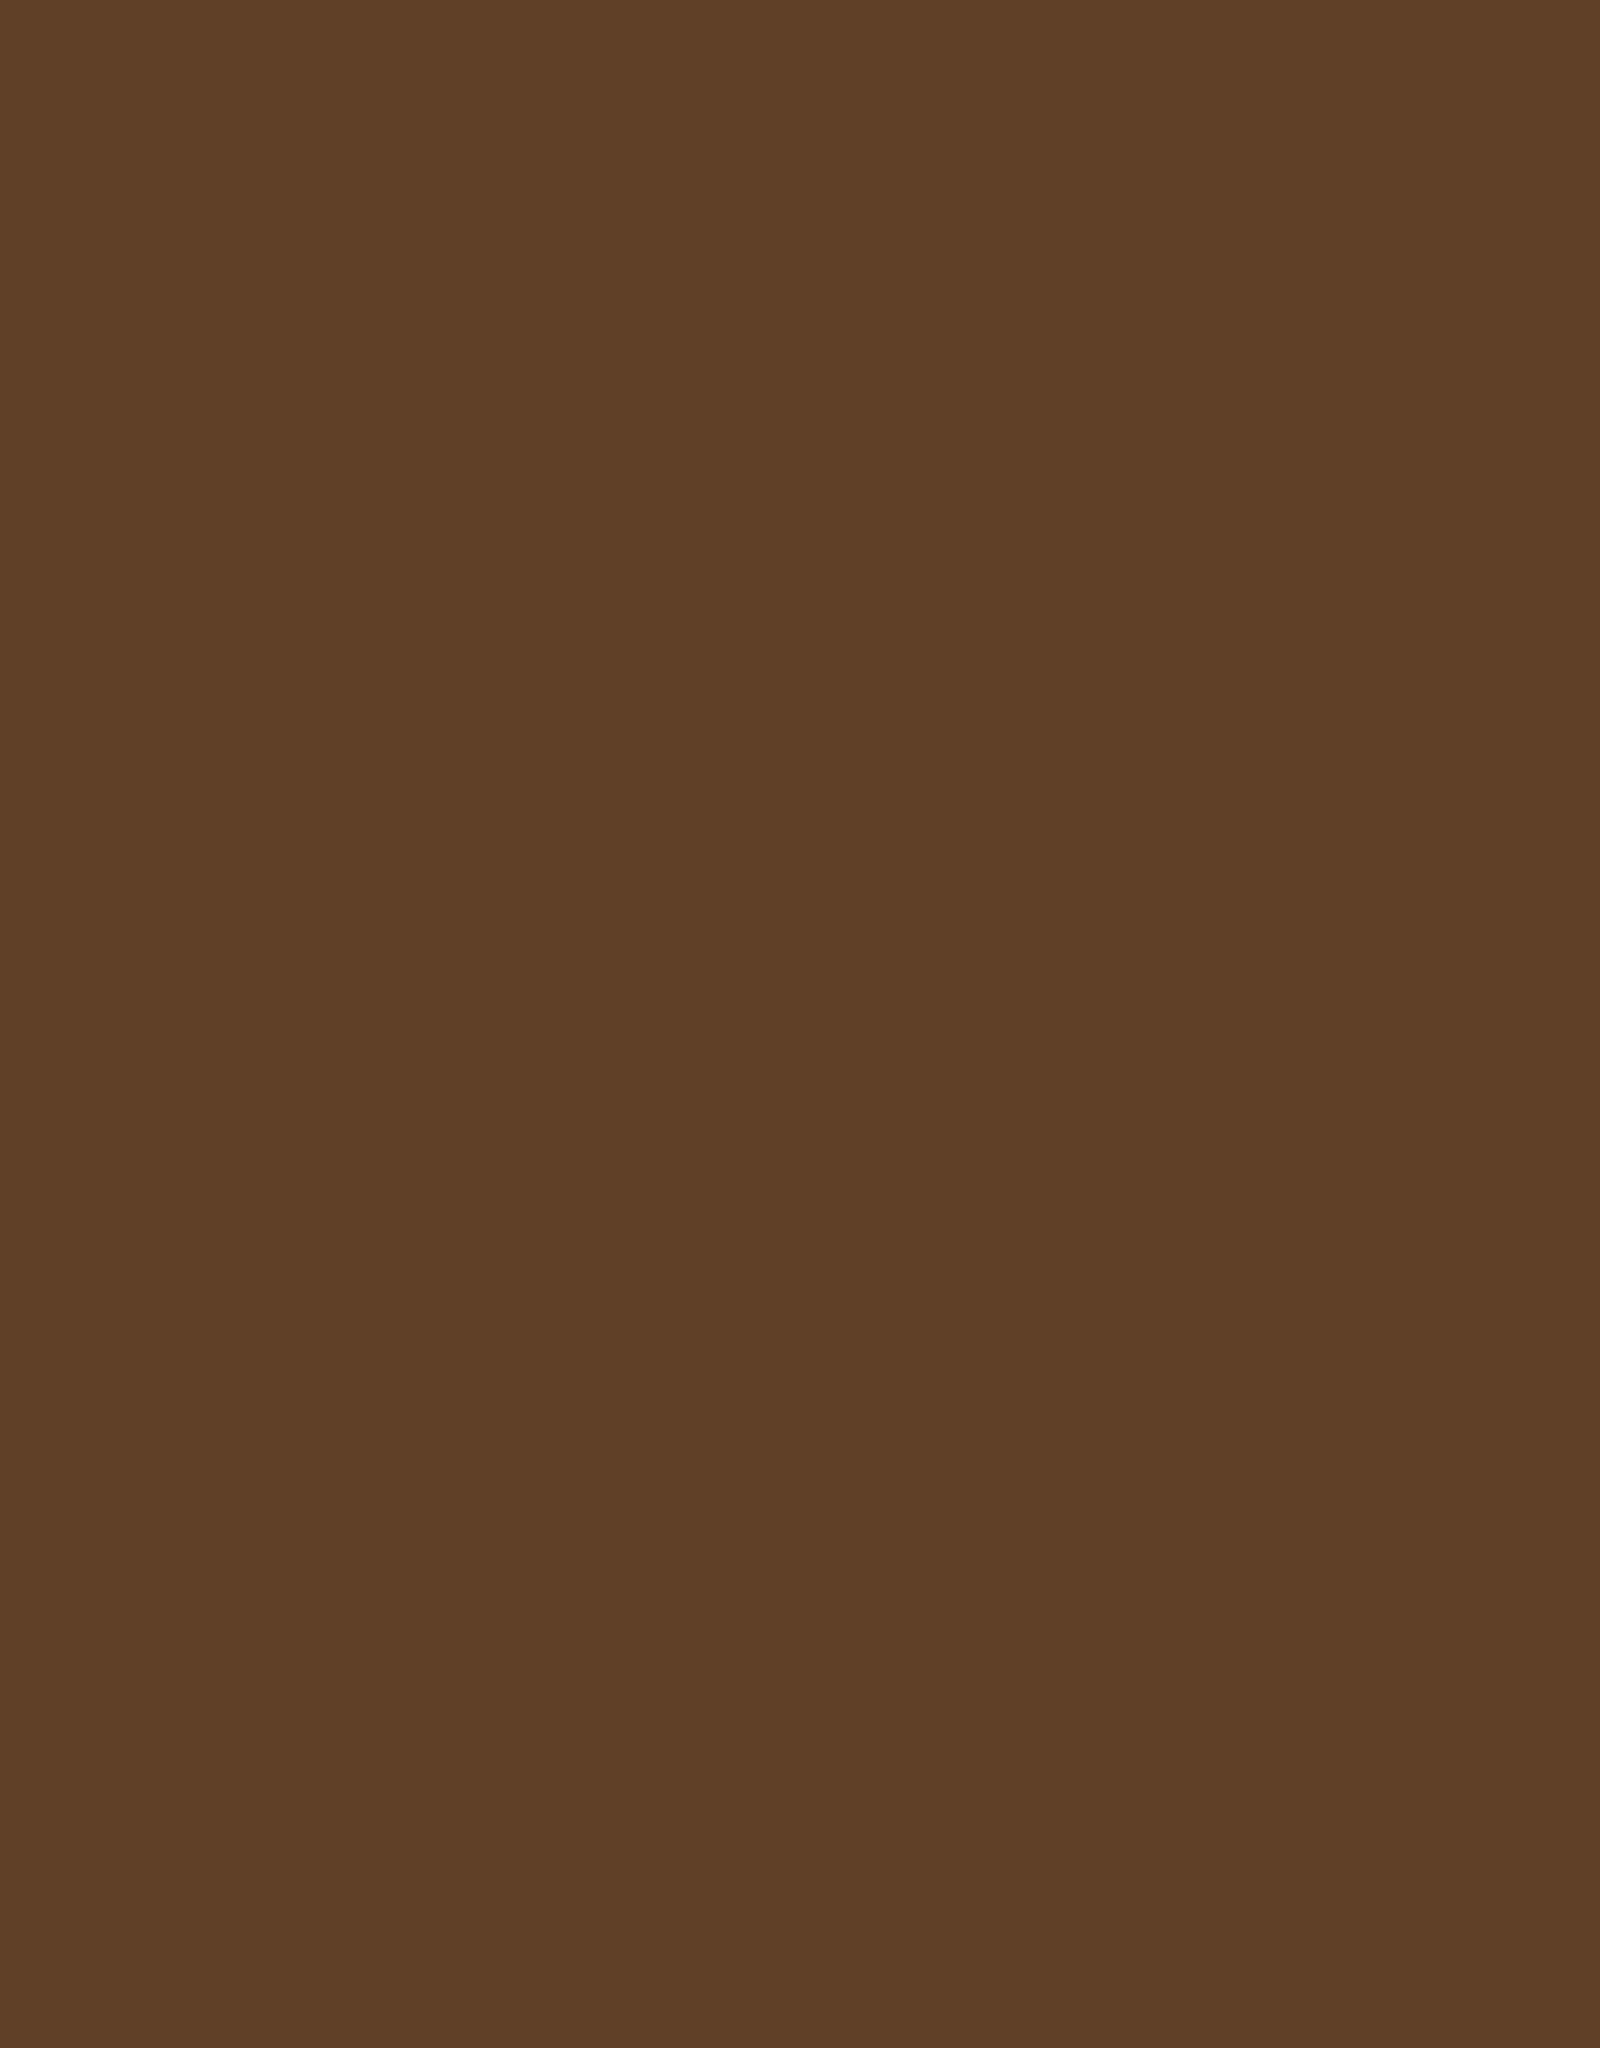 Trasparenze Christine - Panty - Cioccolato 30 denier